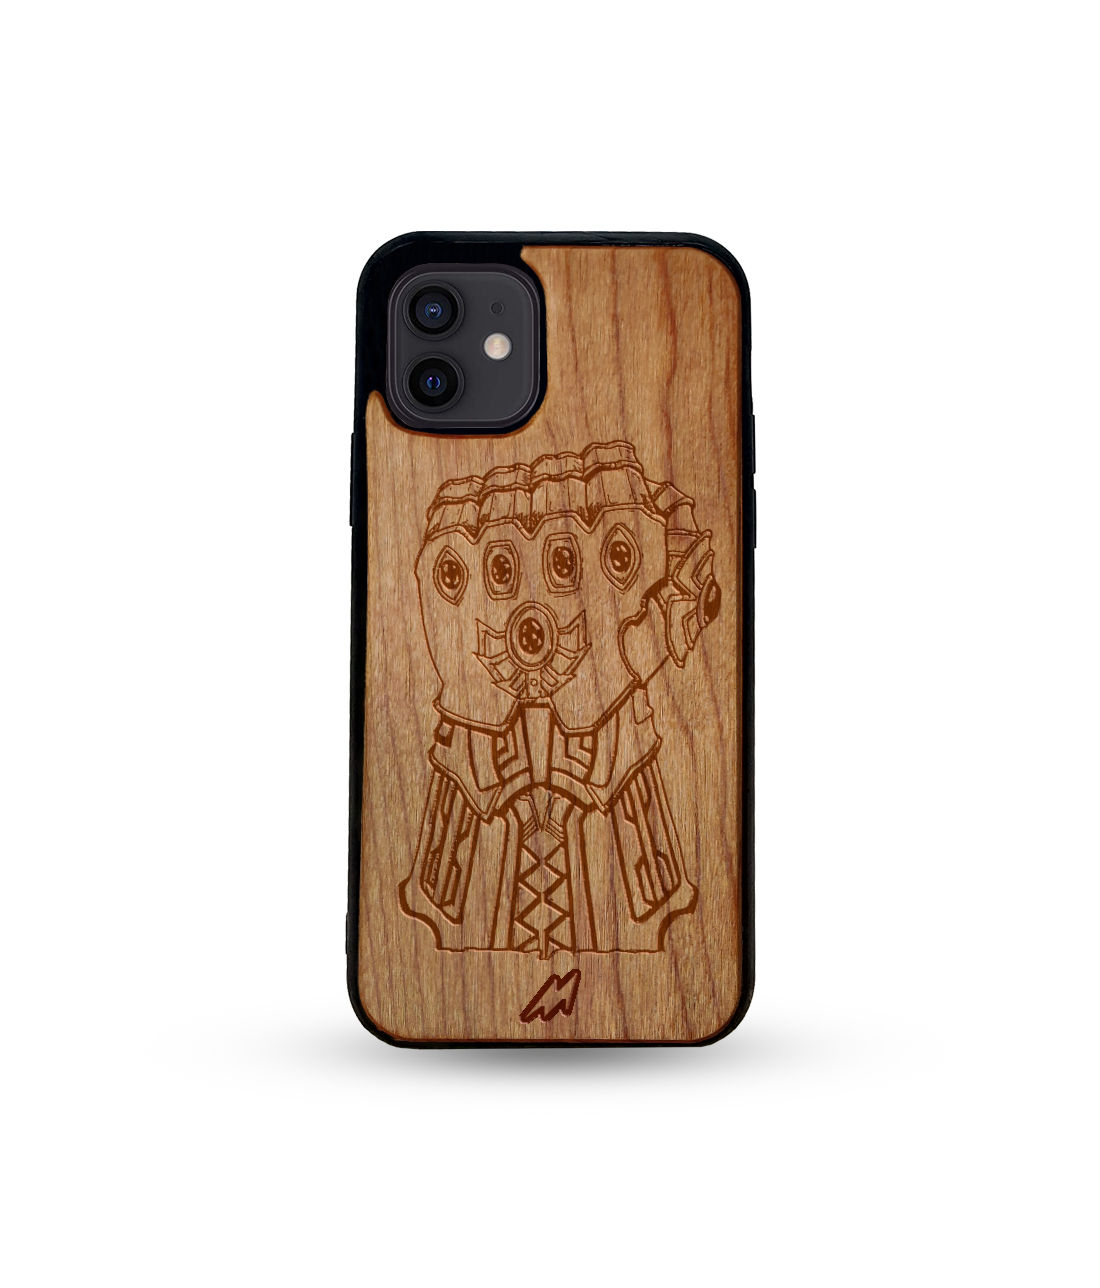 Infinity Gauntlet - Honey Maple Wooden Phone Case for iPhone 12